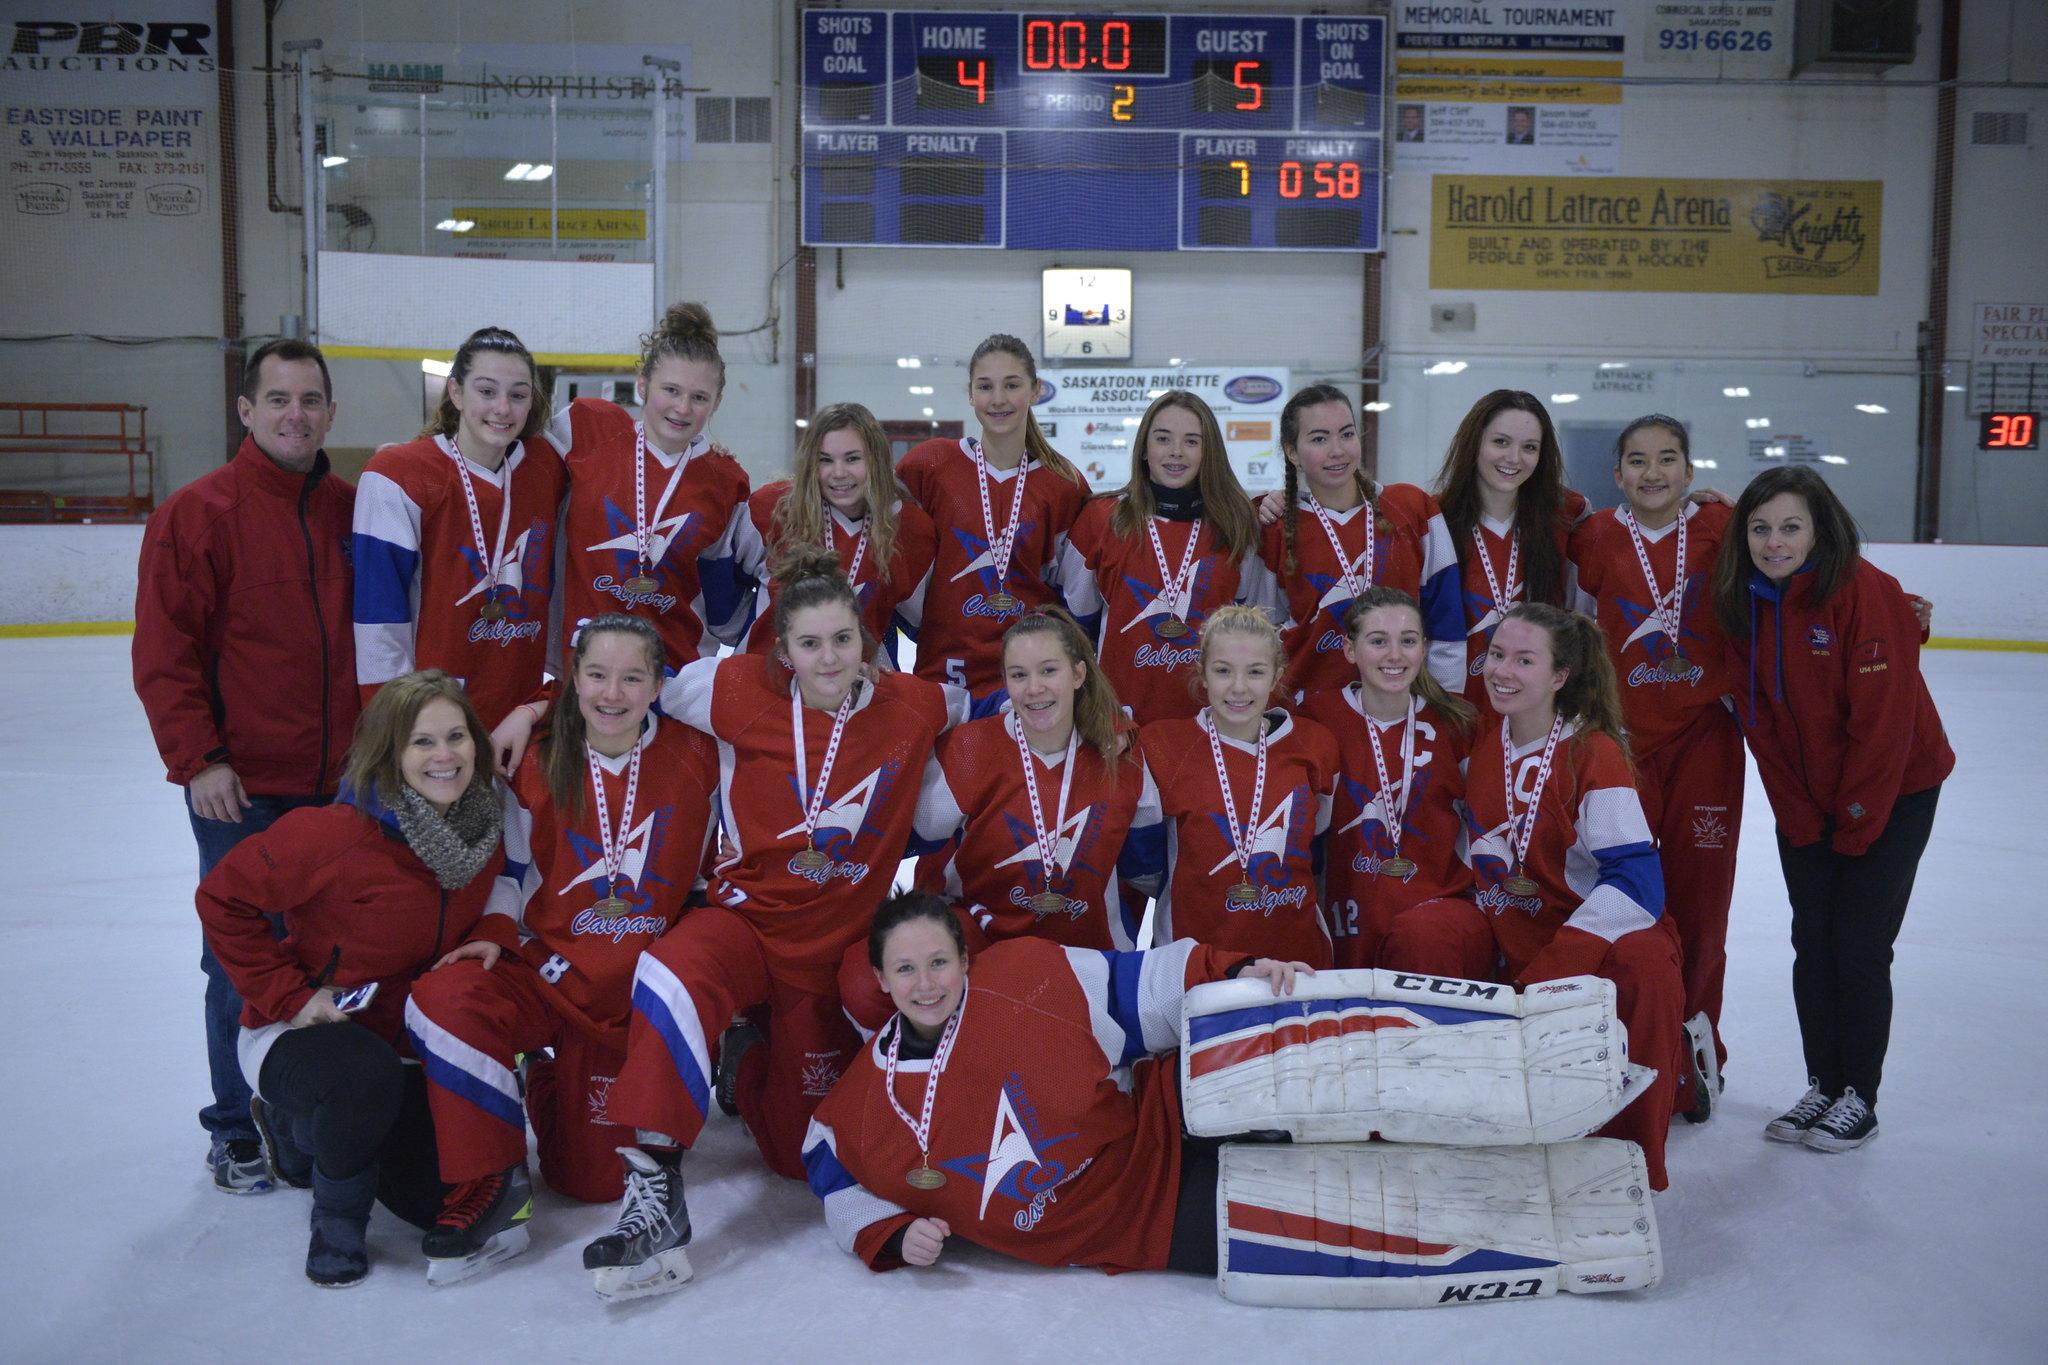 Nov 13, 2016 - Sask BPM - U16AA Pace wins Gold